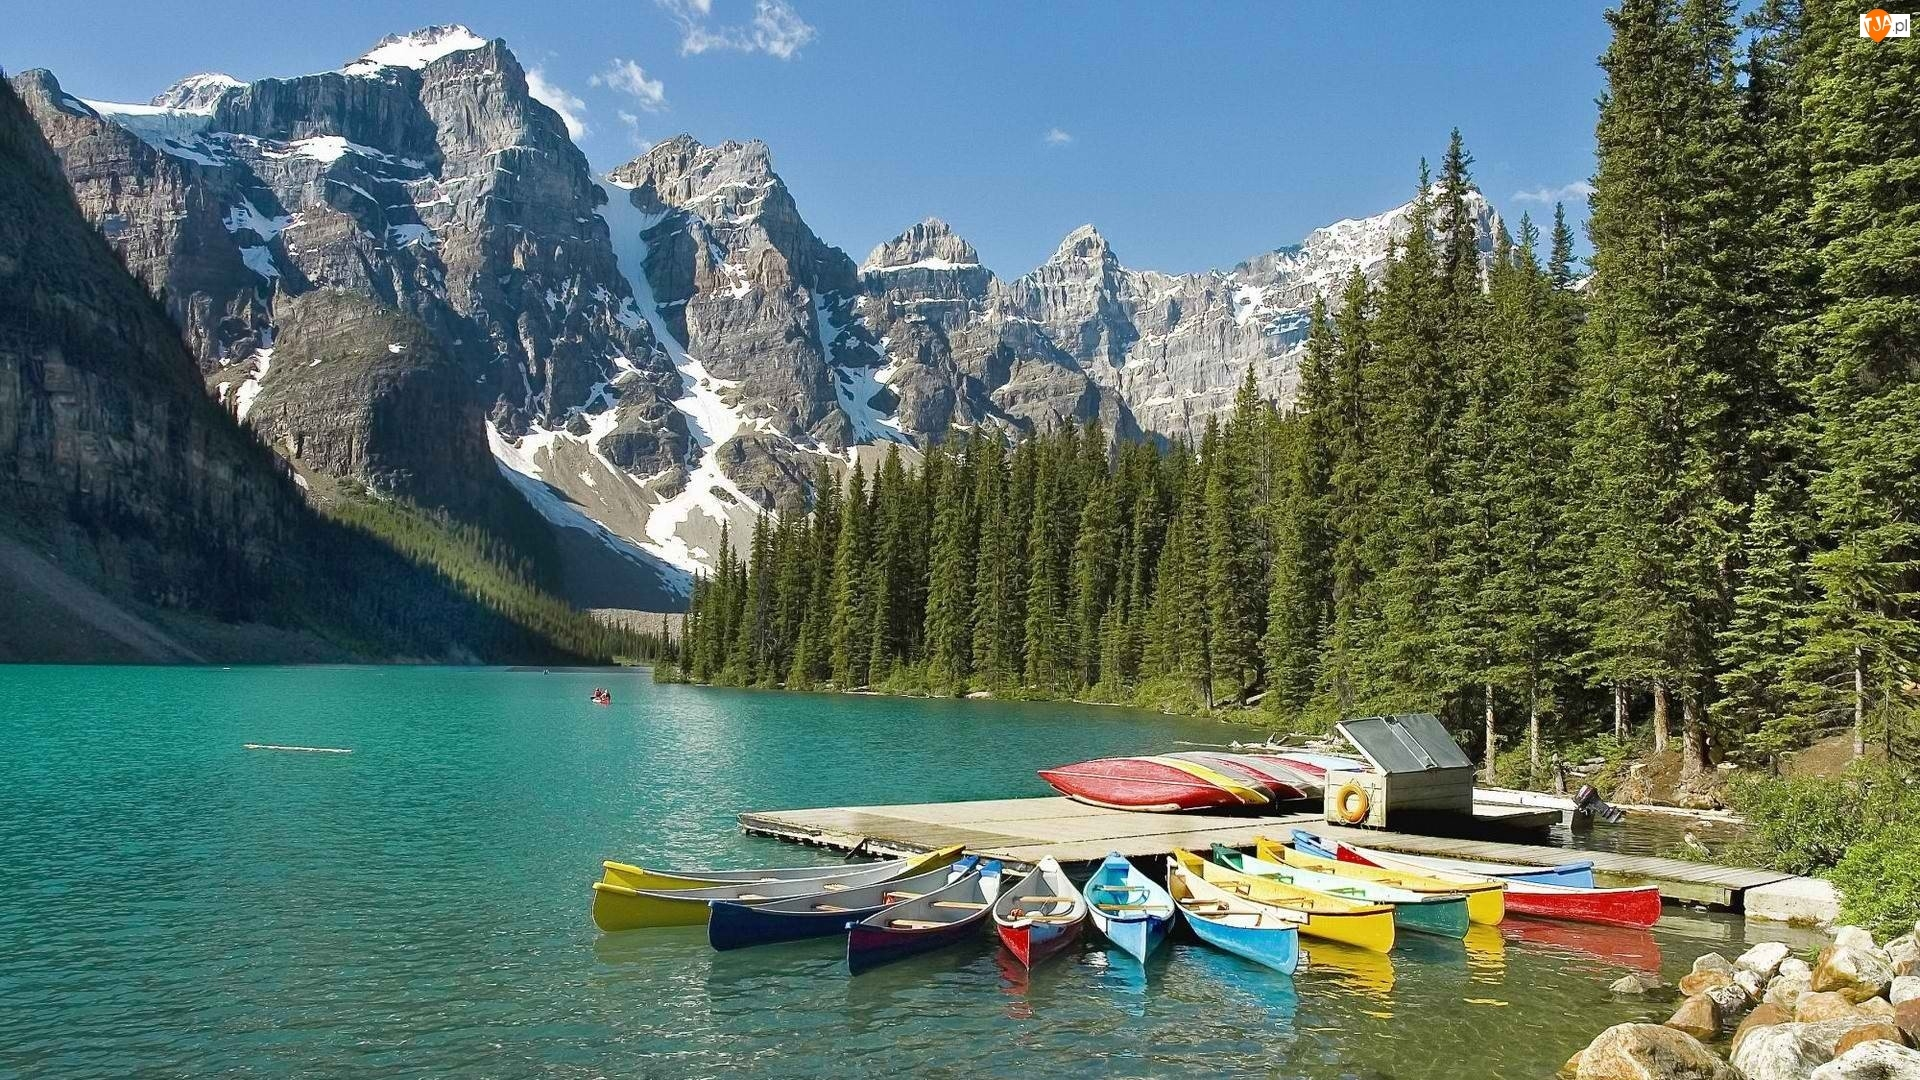 Las, Góry, Pomost, Jezioro, Kajak